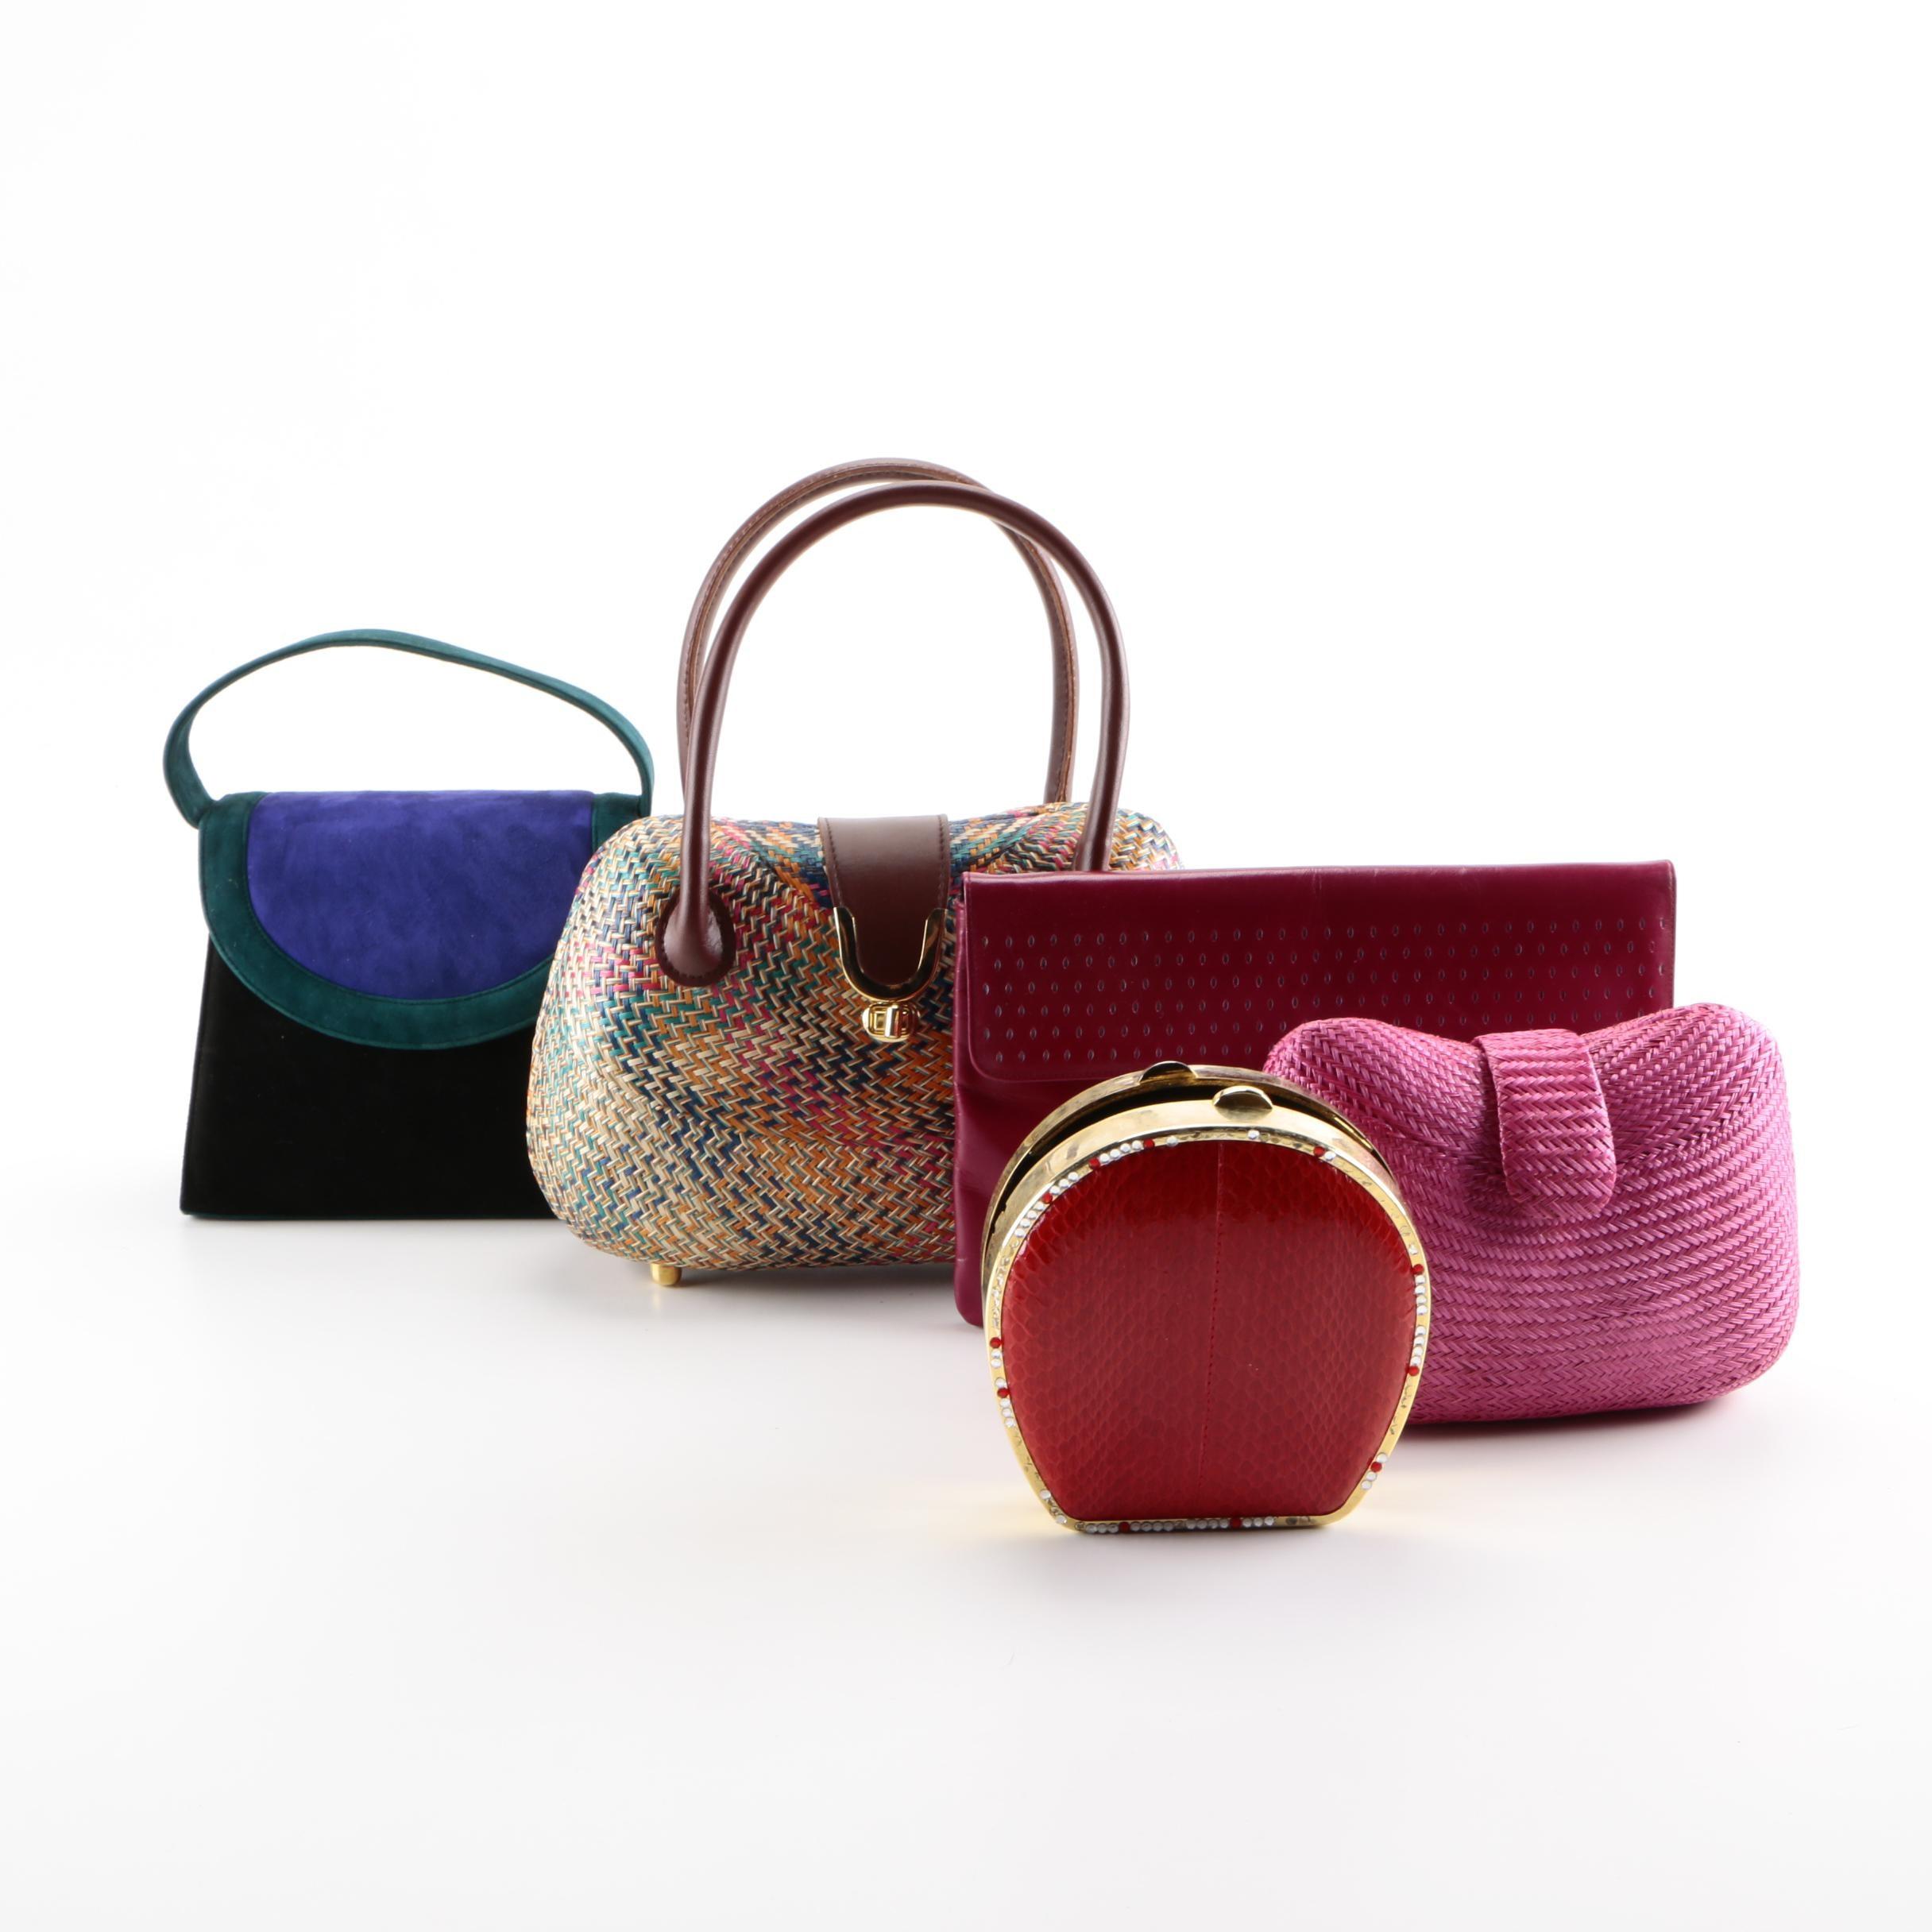 Handbags Including Charles Jourdan